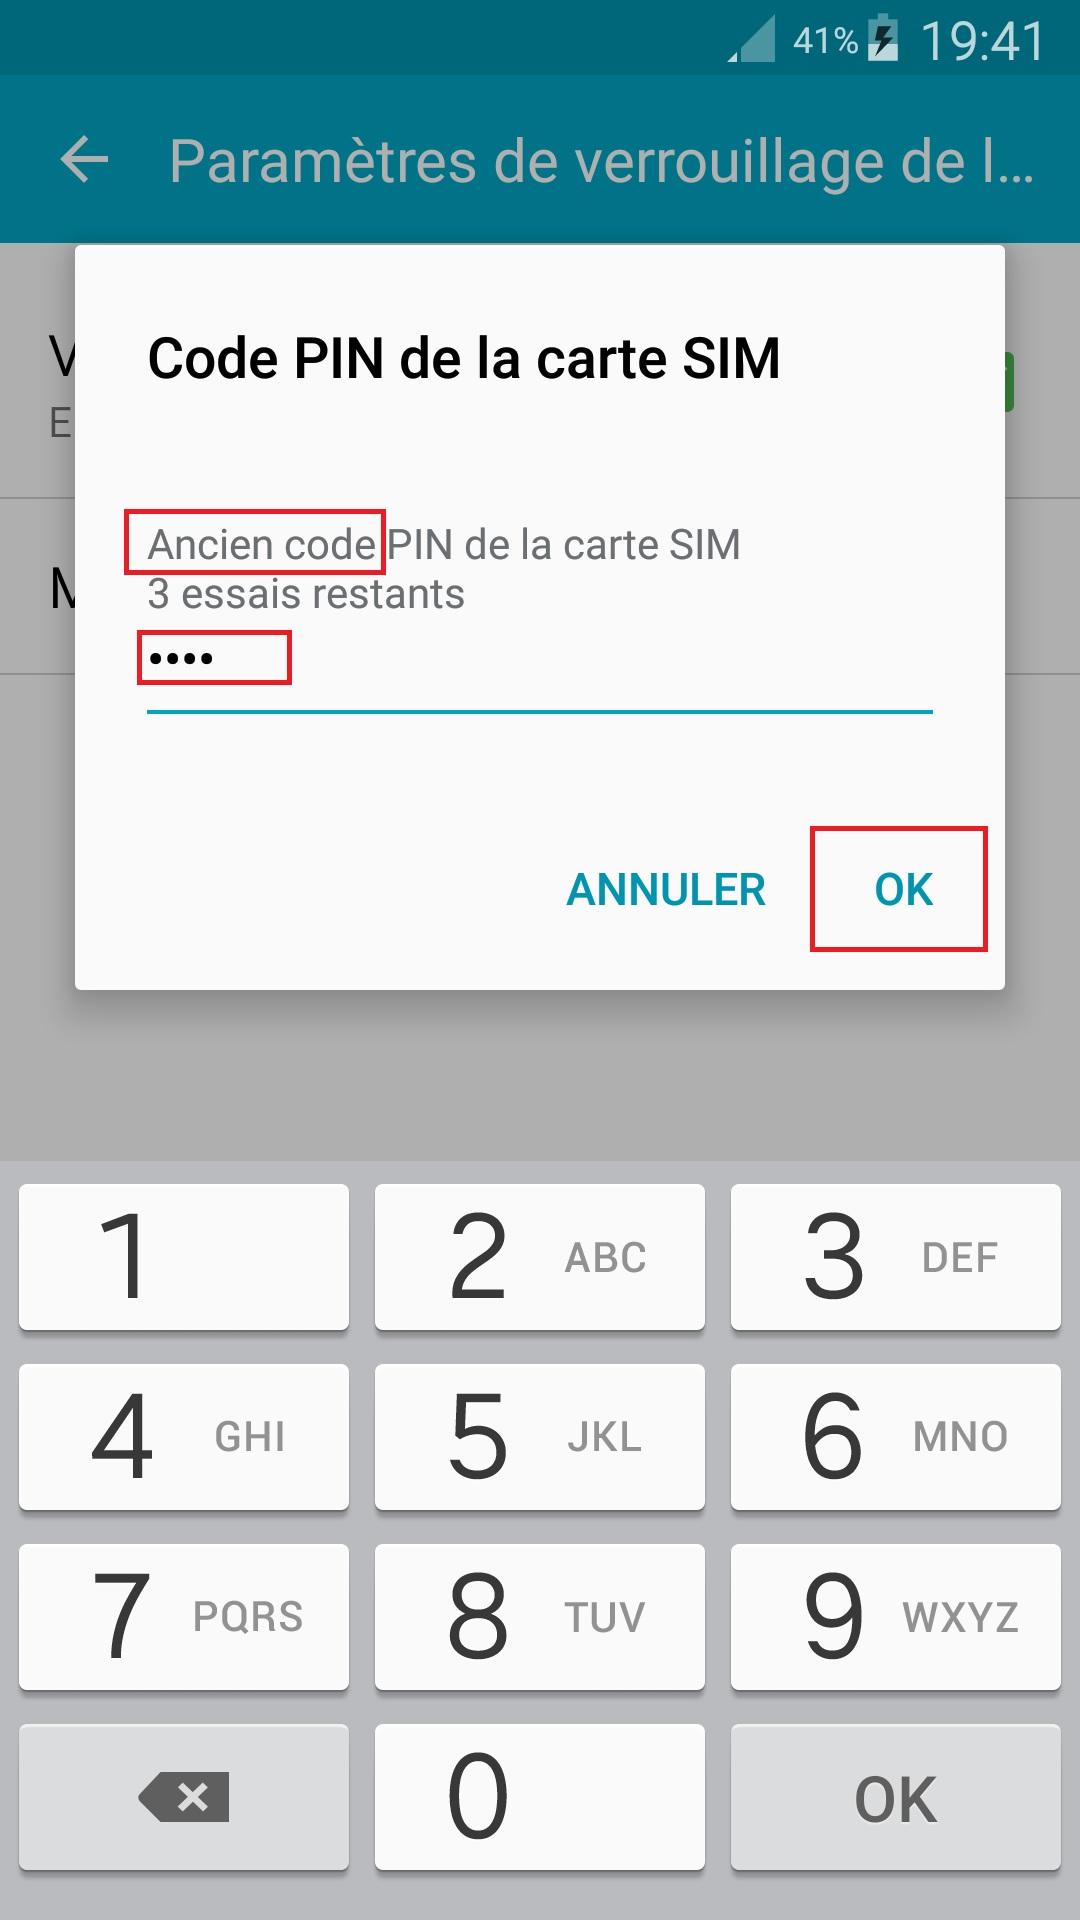 contact code pin ecran verrouillage Acer android 4.2 code pin ancien